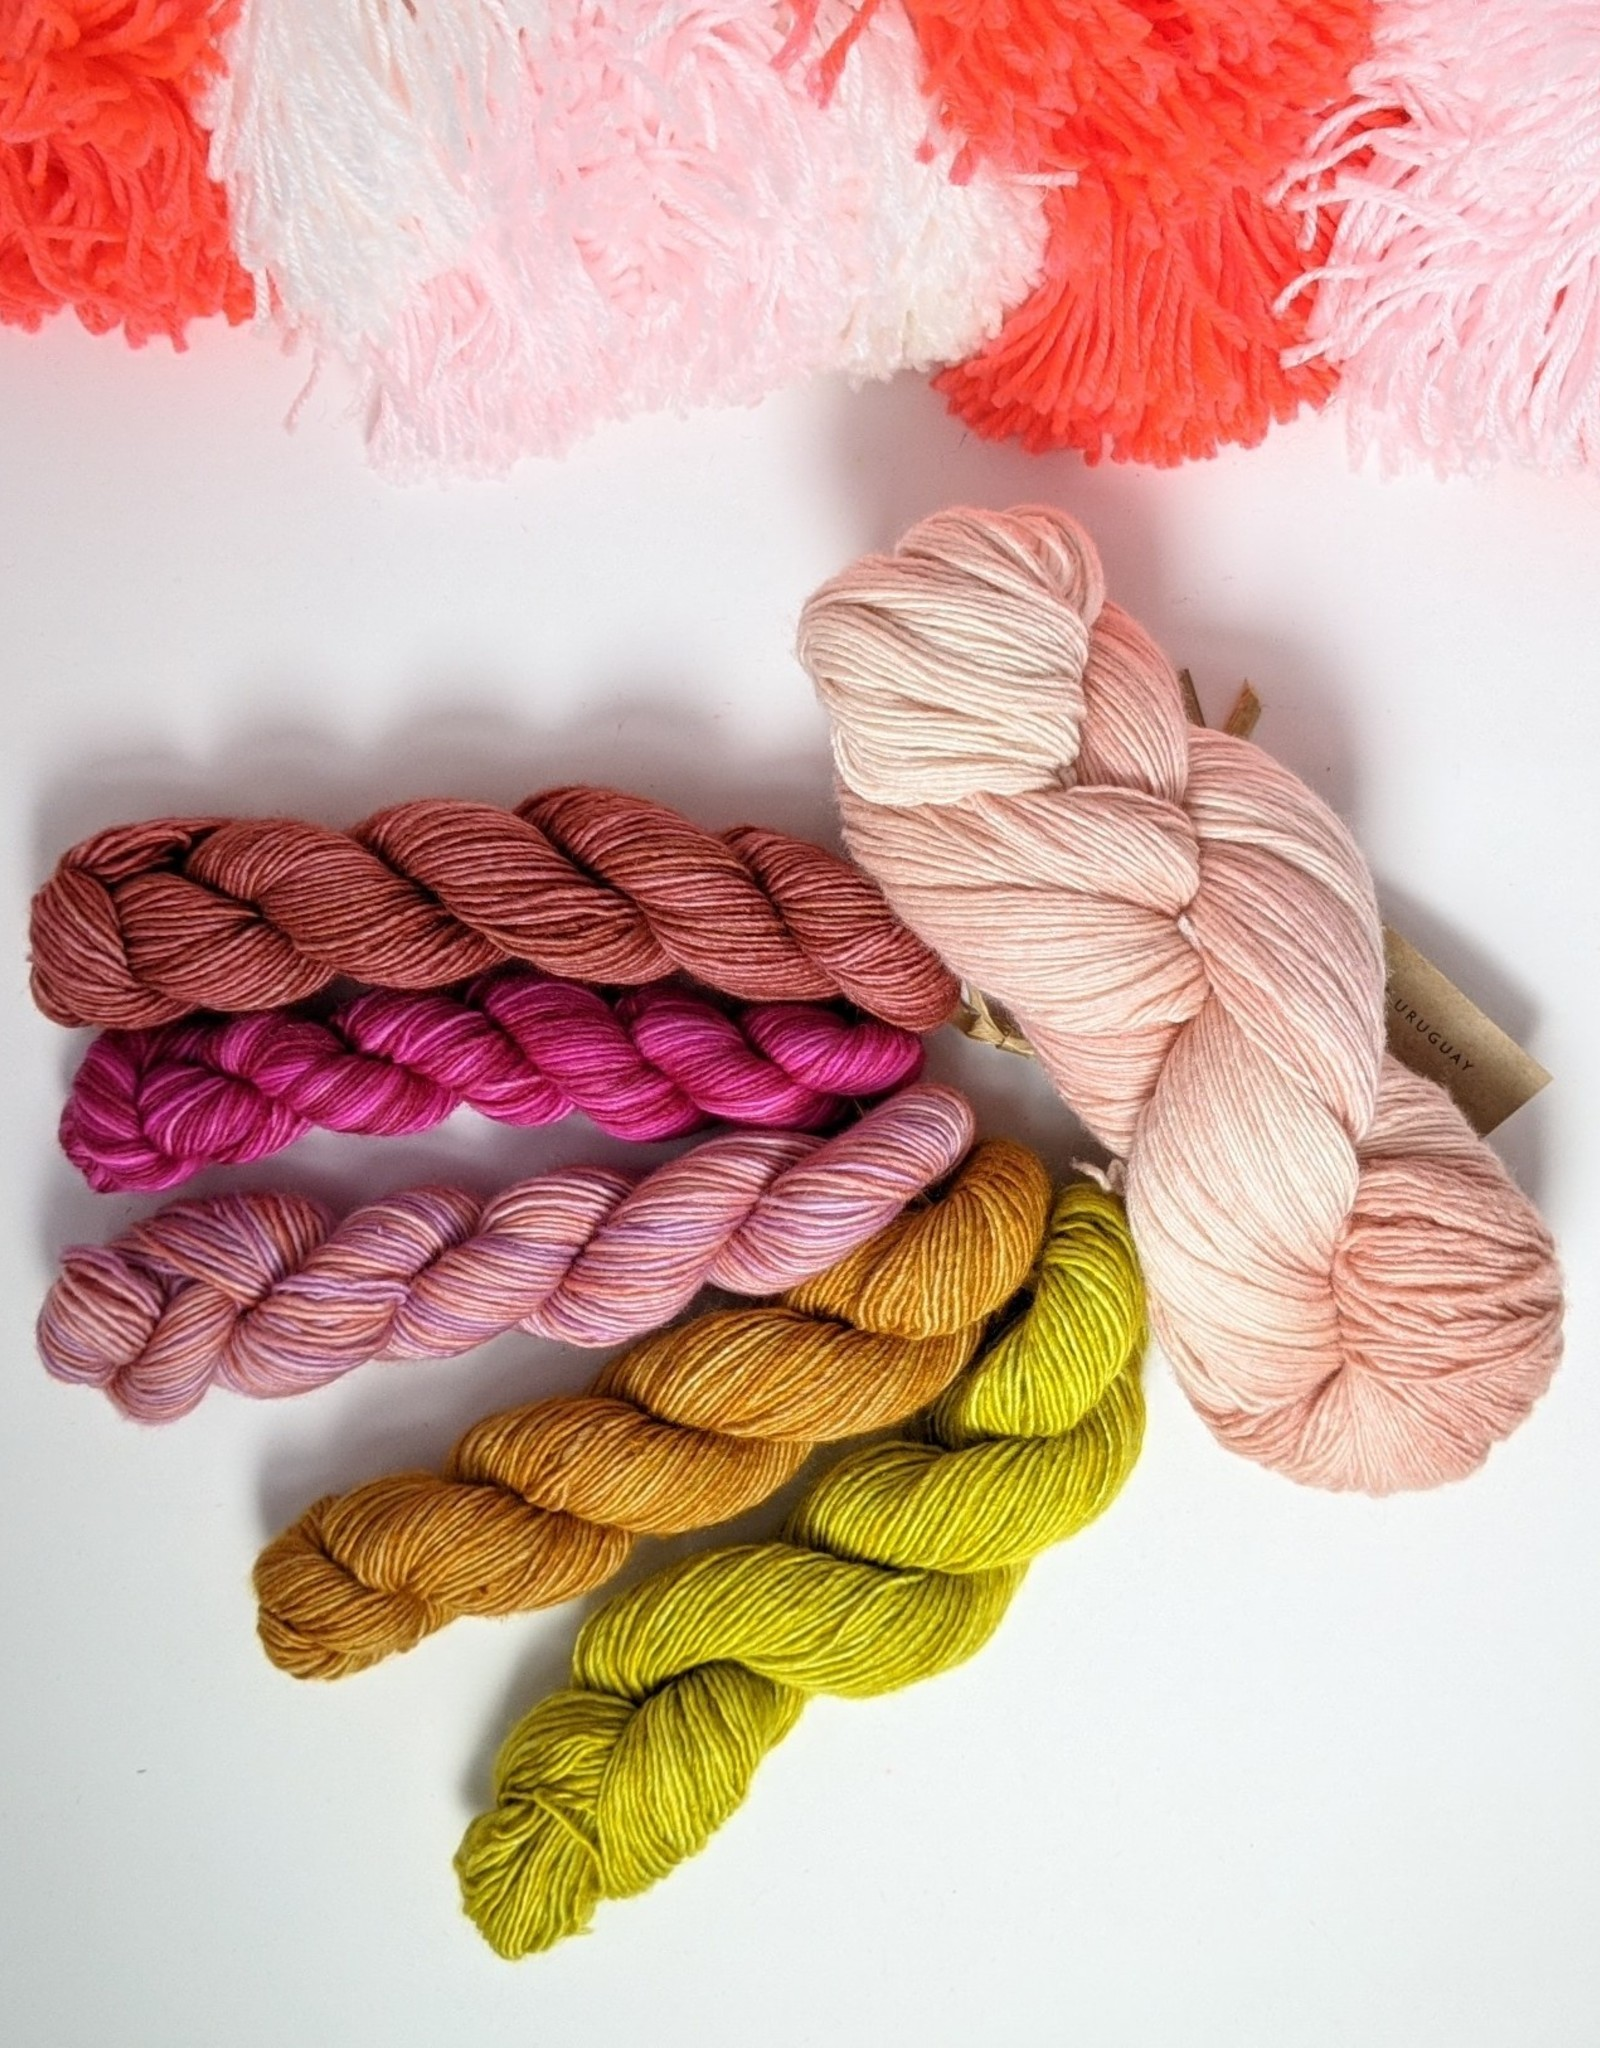 fibre space Fino Shawl Kit - Blooms